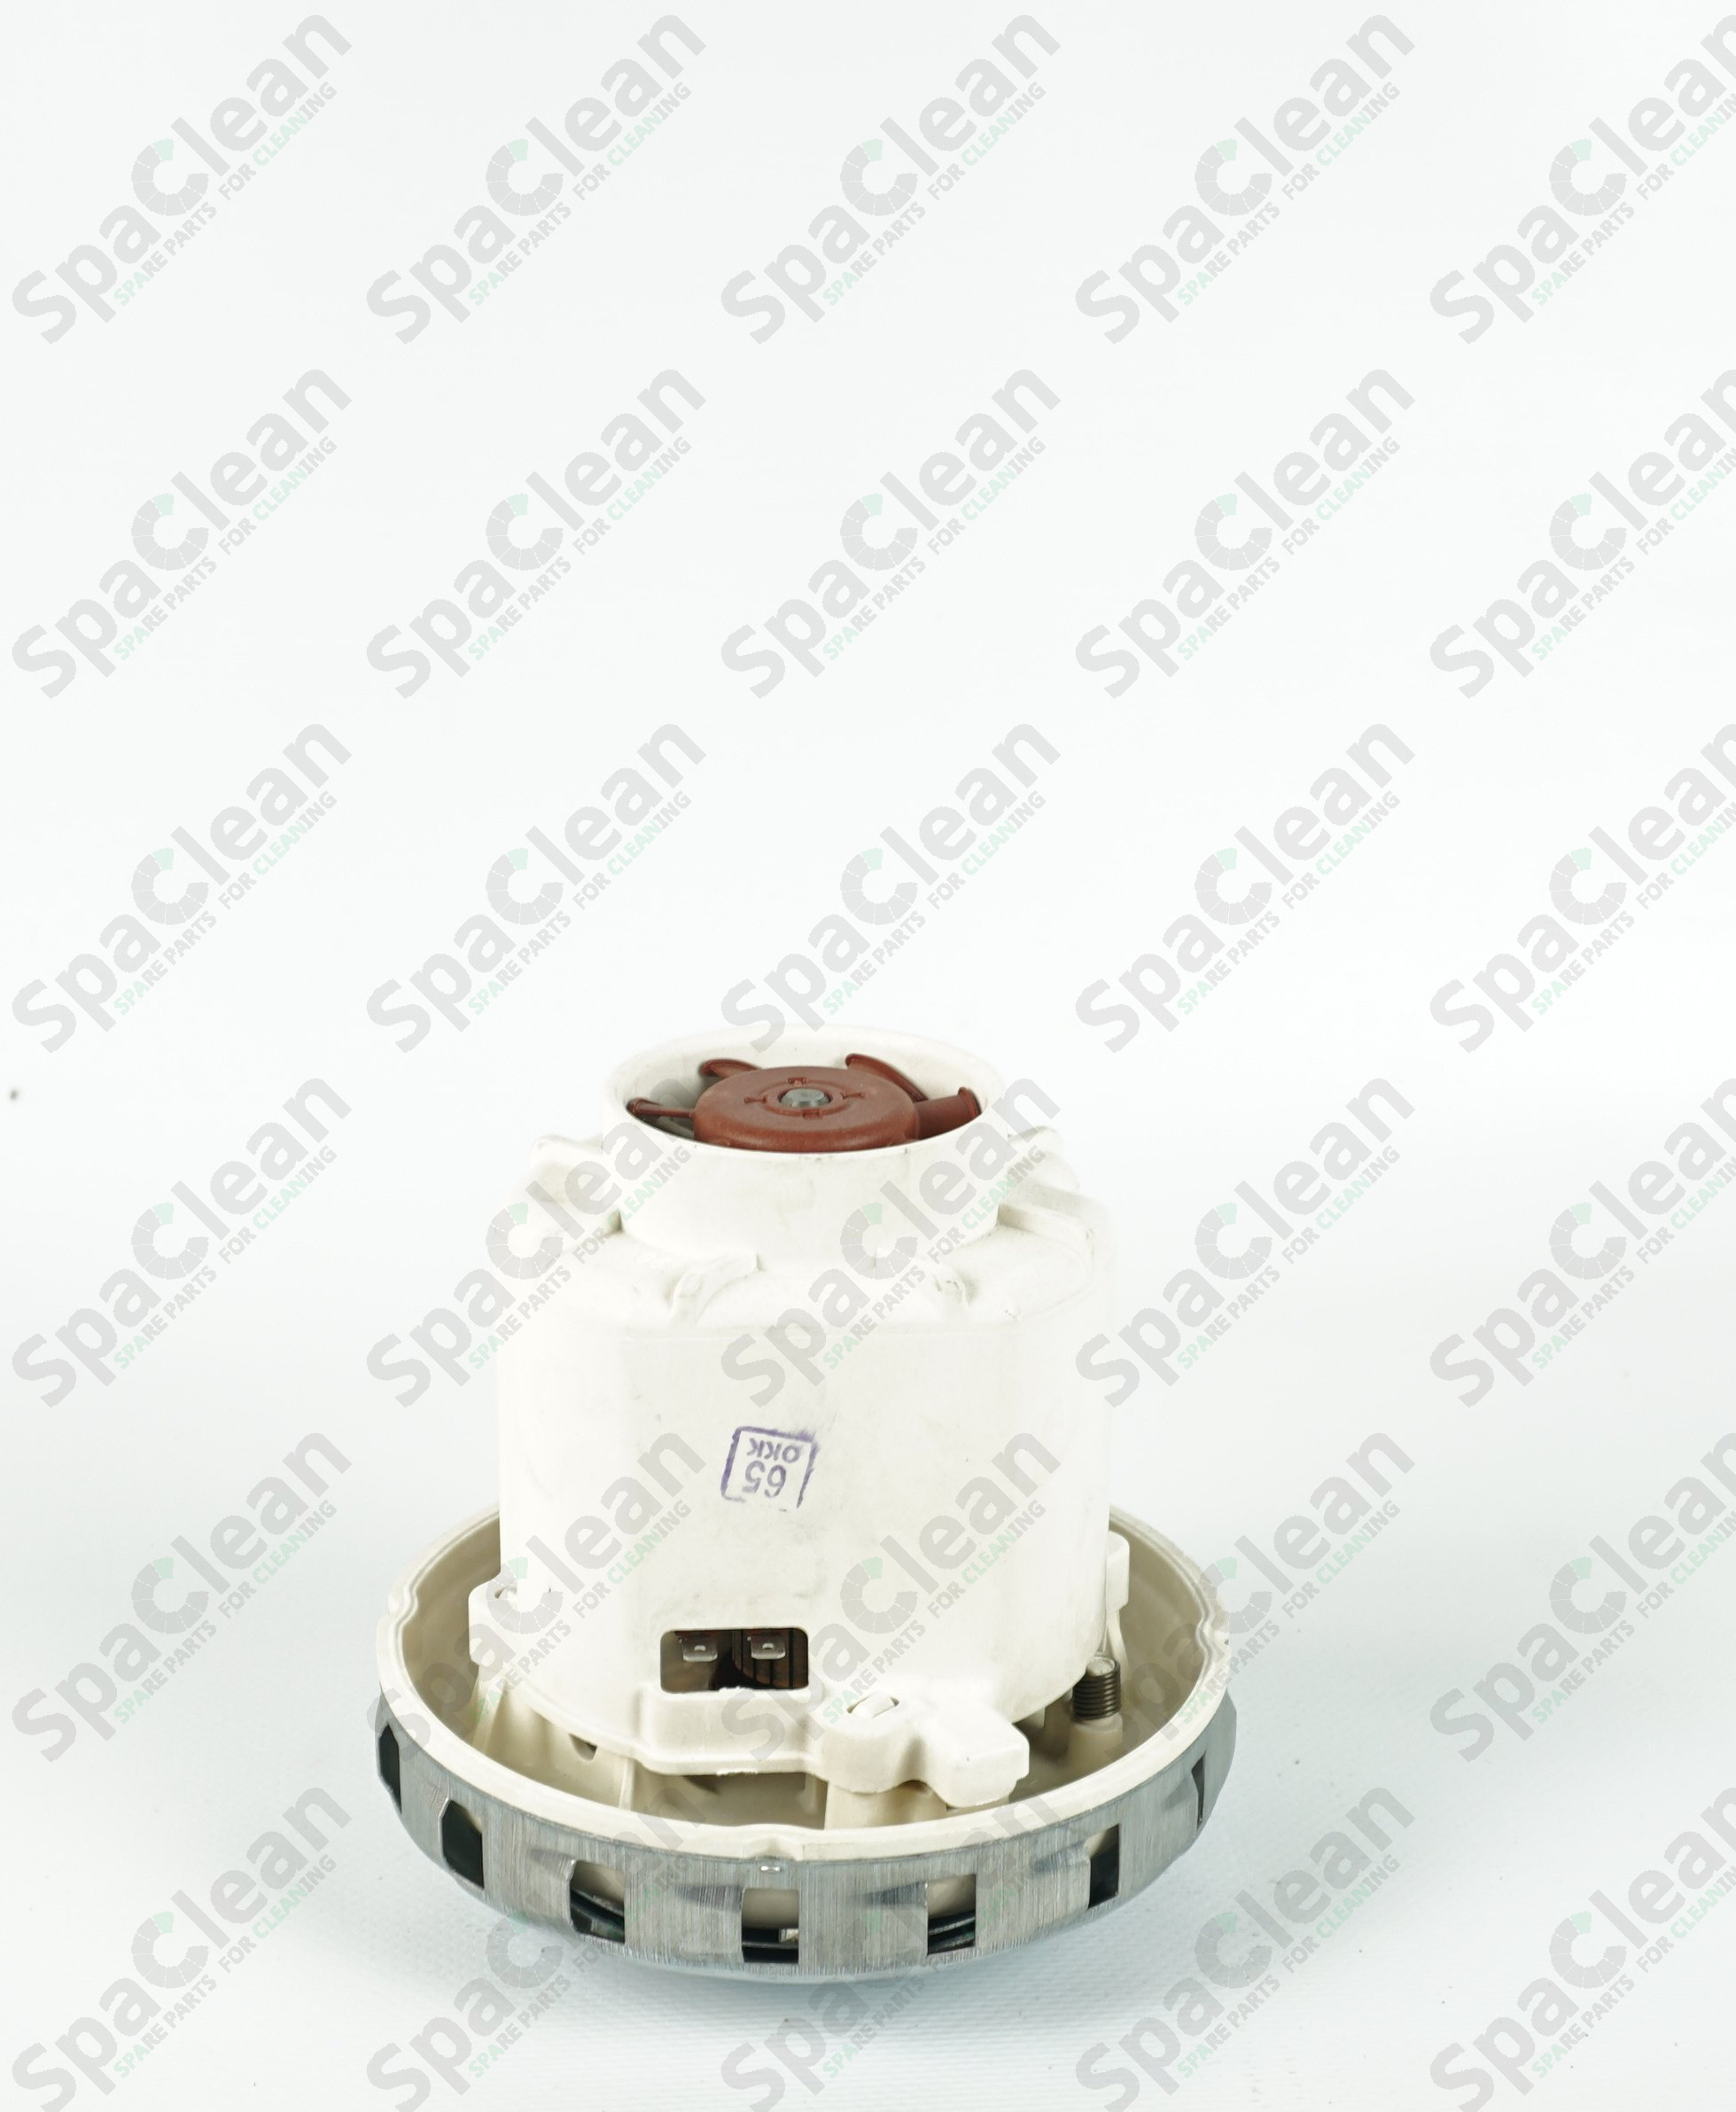 Вакуумный мотор Domel 230V 1100W Одностадийный для Ghibli POWER WD 80.2 I TPT 230V EXP